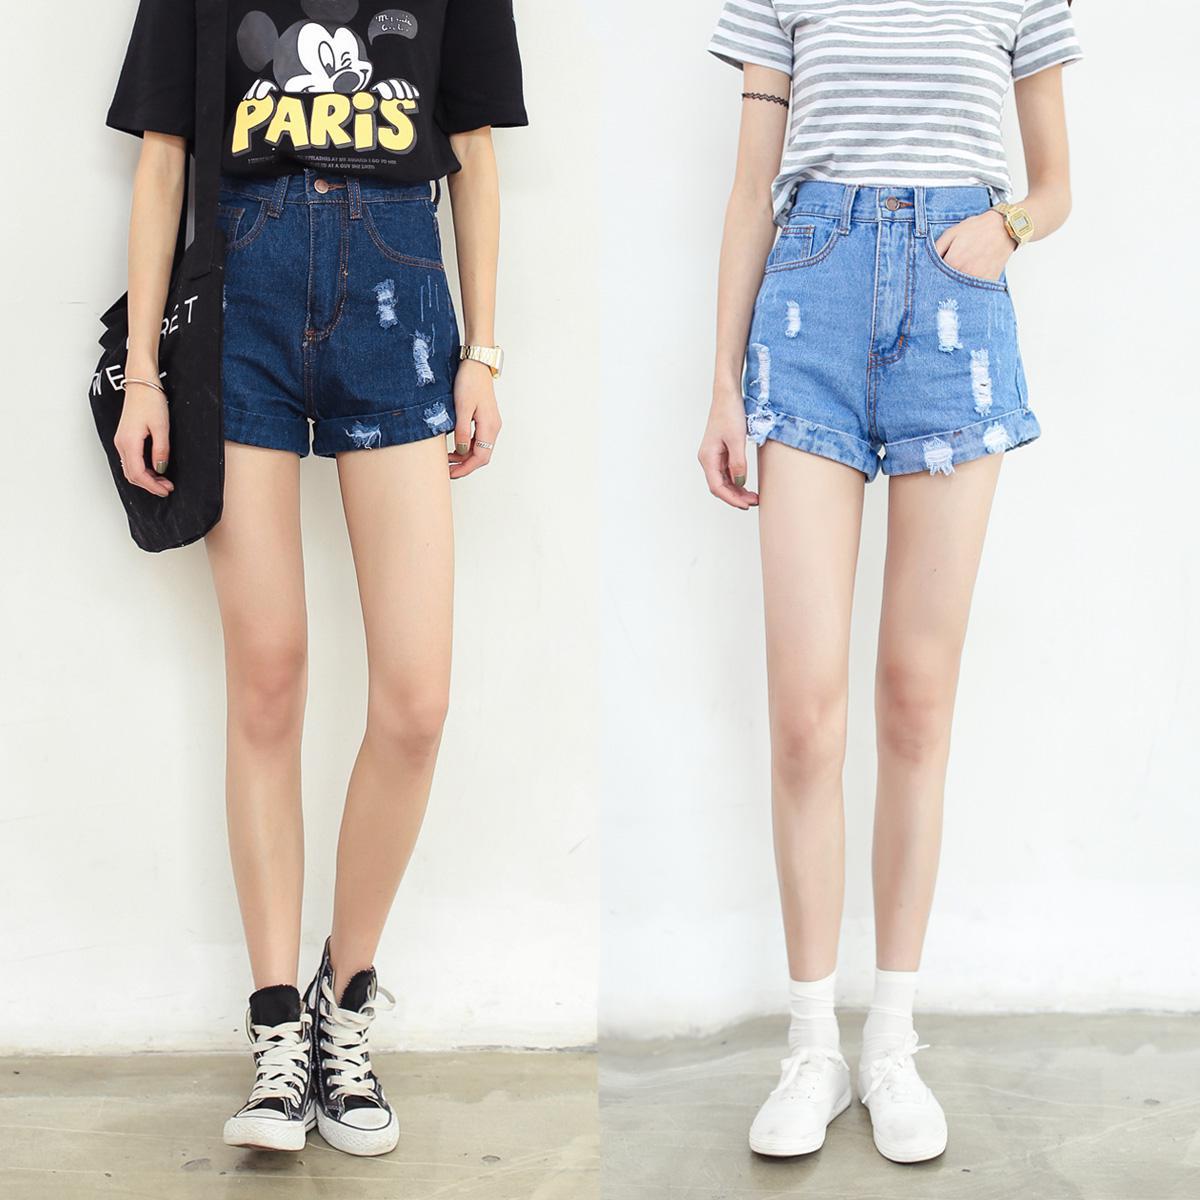 2018 Mihoshop Ulzzang Korean Women Fashion Casual Preppy Clothing High Street All Match High